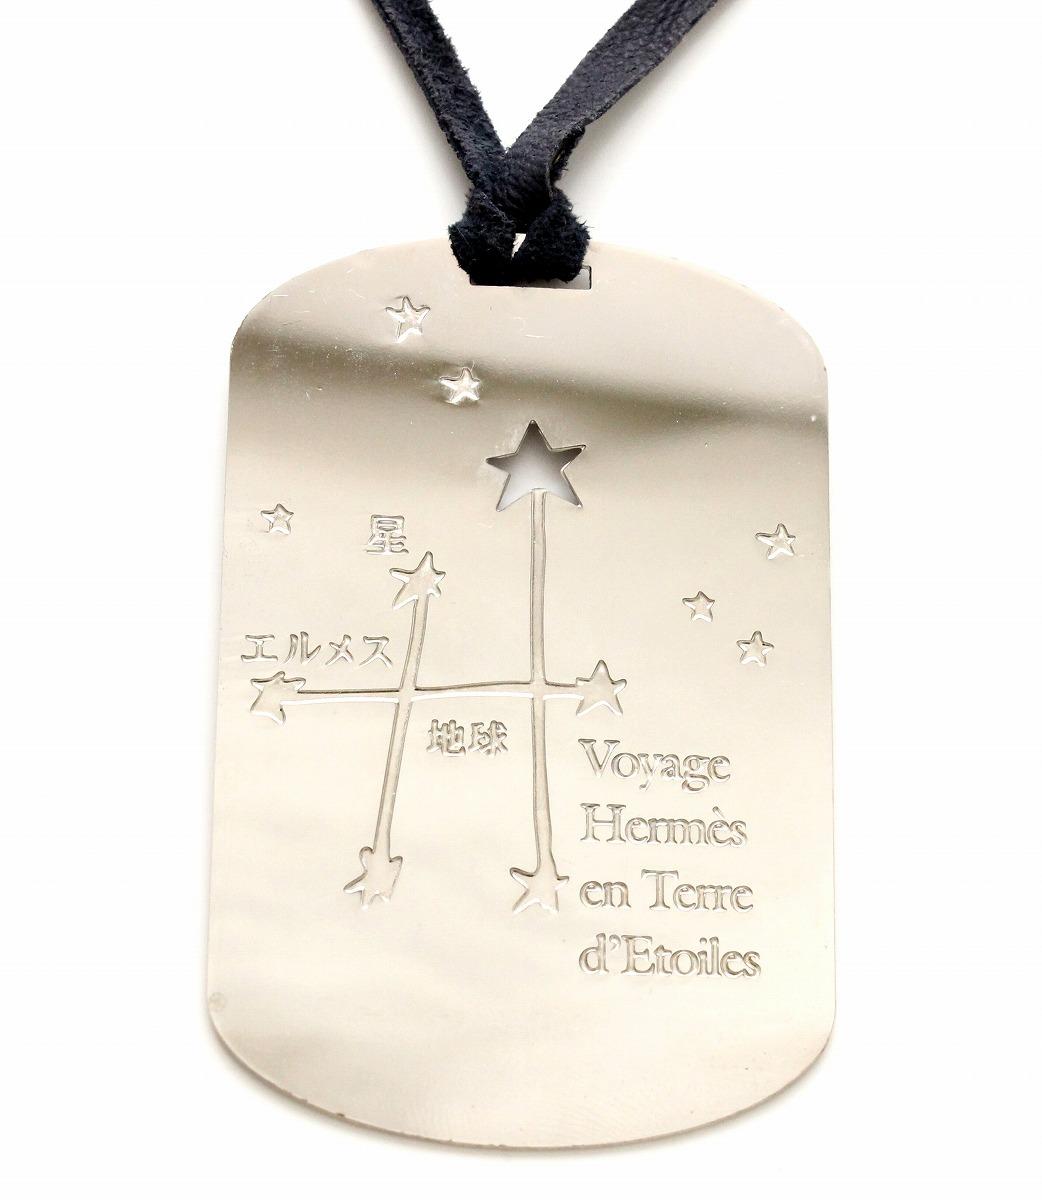 HERMES エルメス 星を巡る旅展 限定品 ネックレス タグ レザー メタル シルバーカラー ネイビー 紺 【中古】【k】